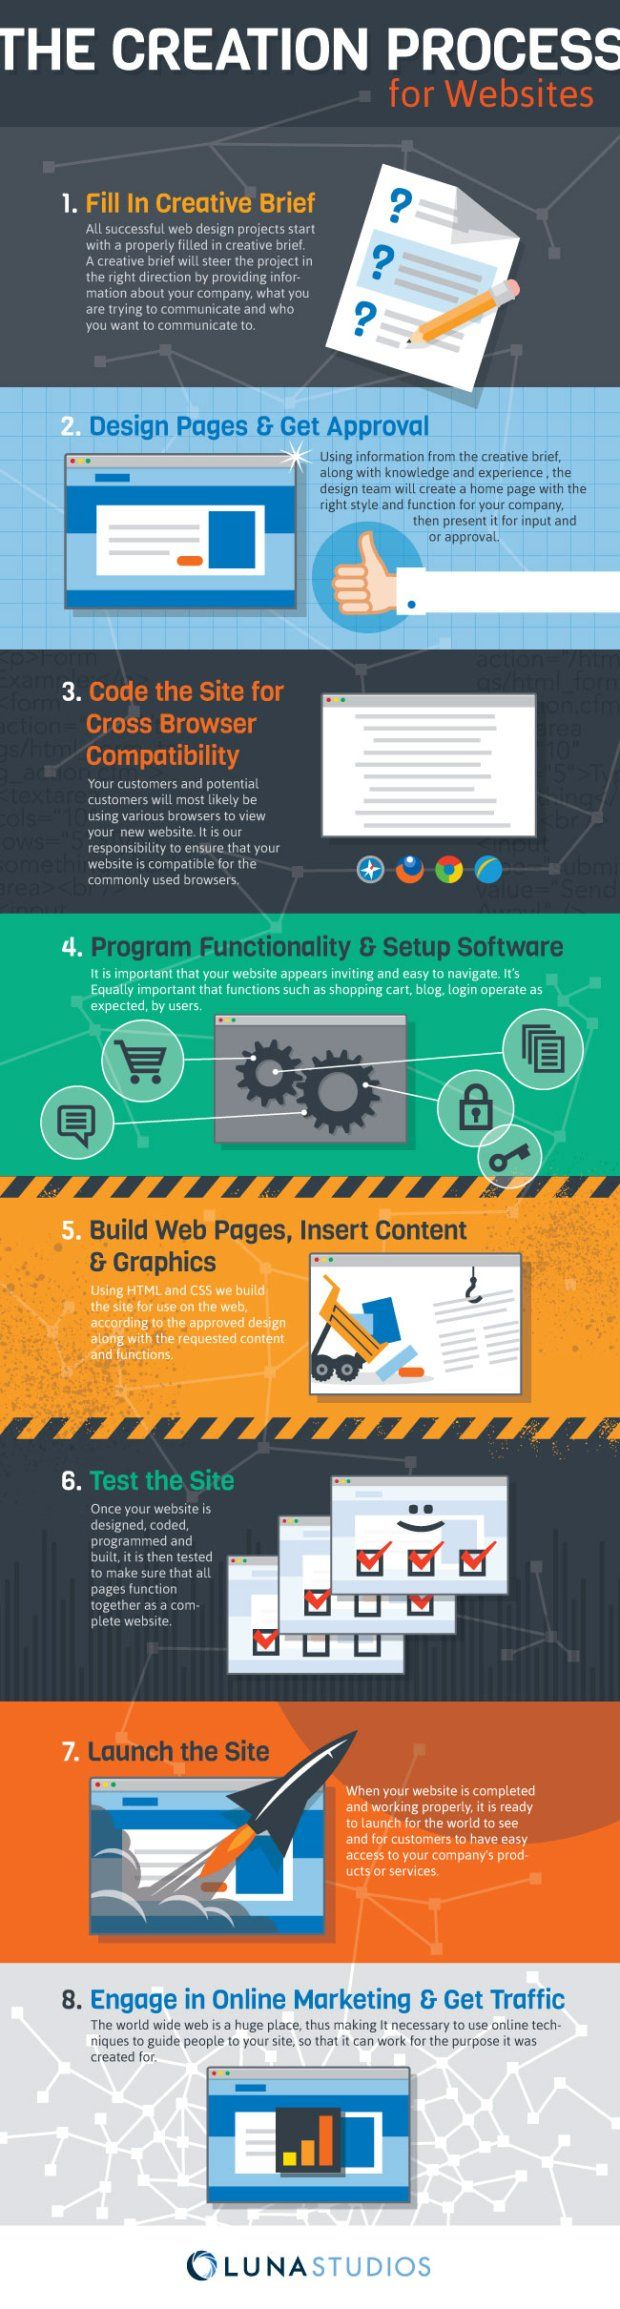 Check Out The Job Description Of A Web Designer Http Beckh Hubpages Com Hub Job Descrip Small Business Web Design Web Design Infographic Business Web Design